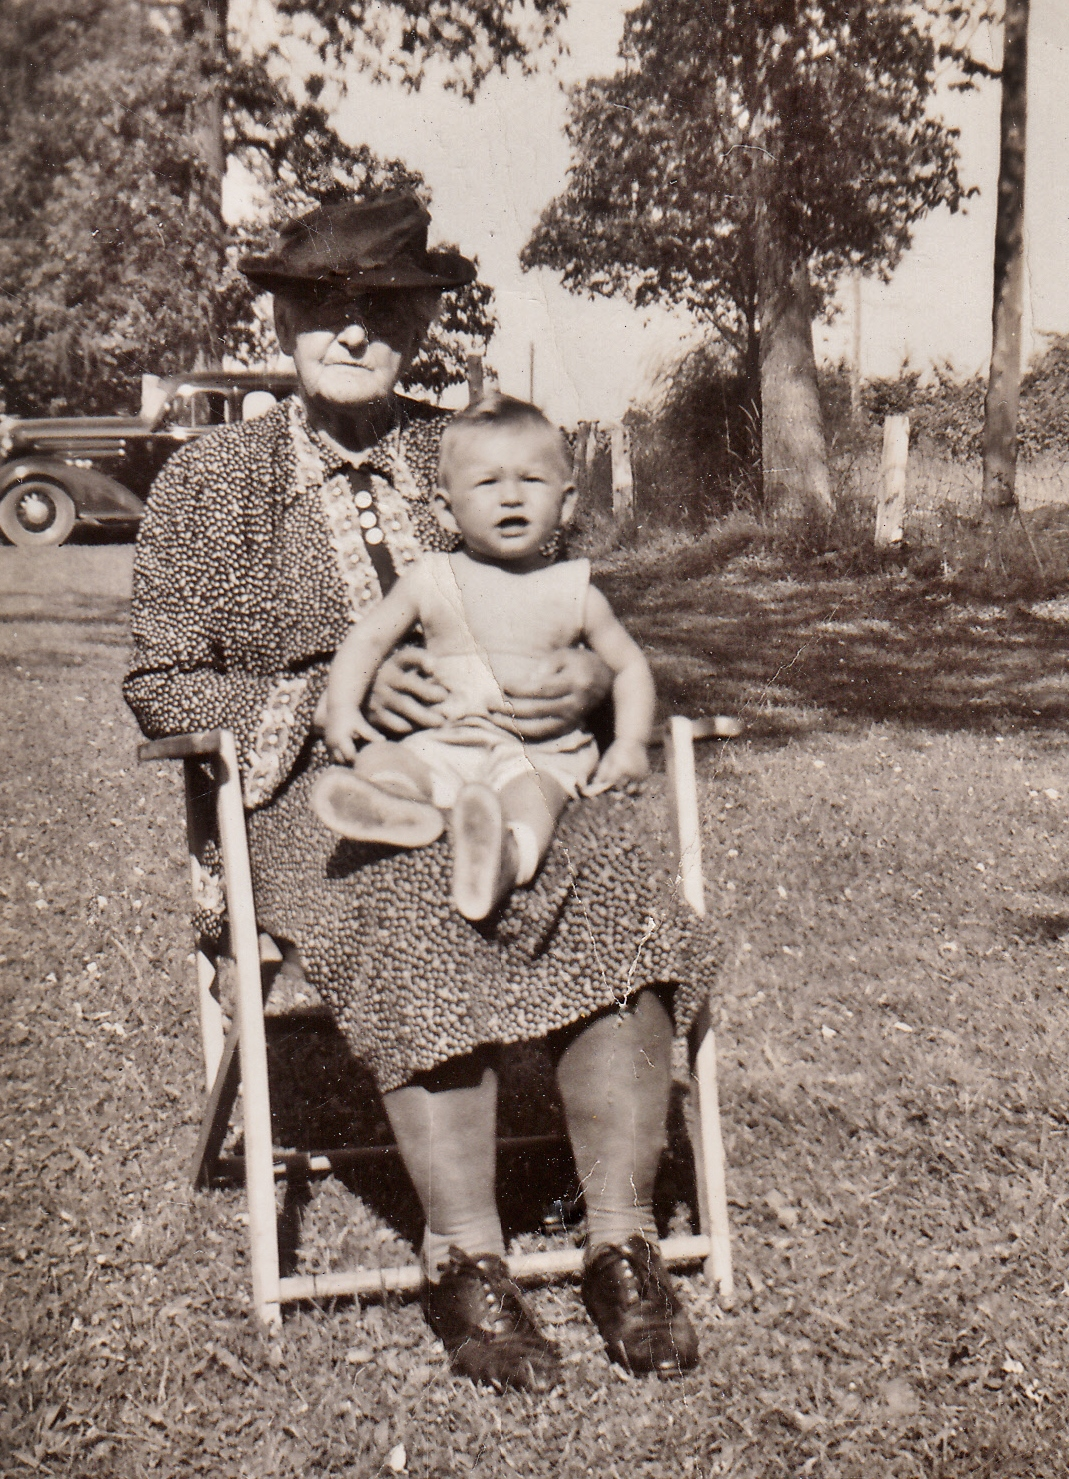 Grandma Lough with Lois Lough daughter of Clinton